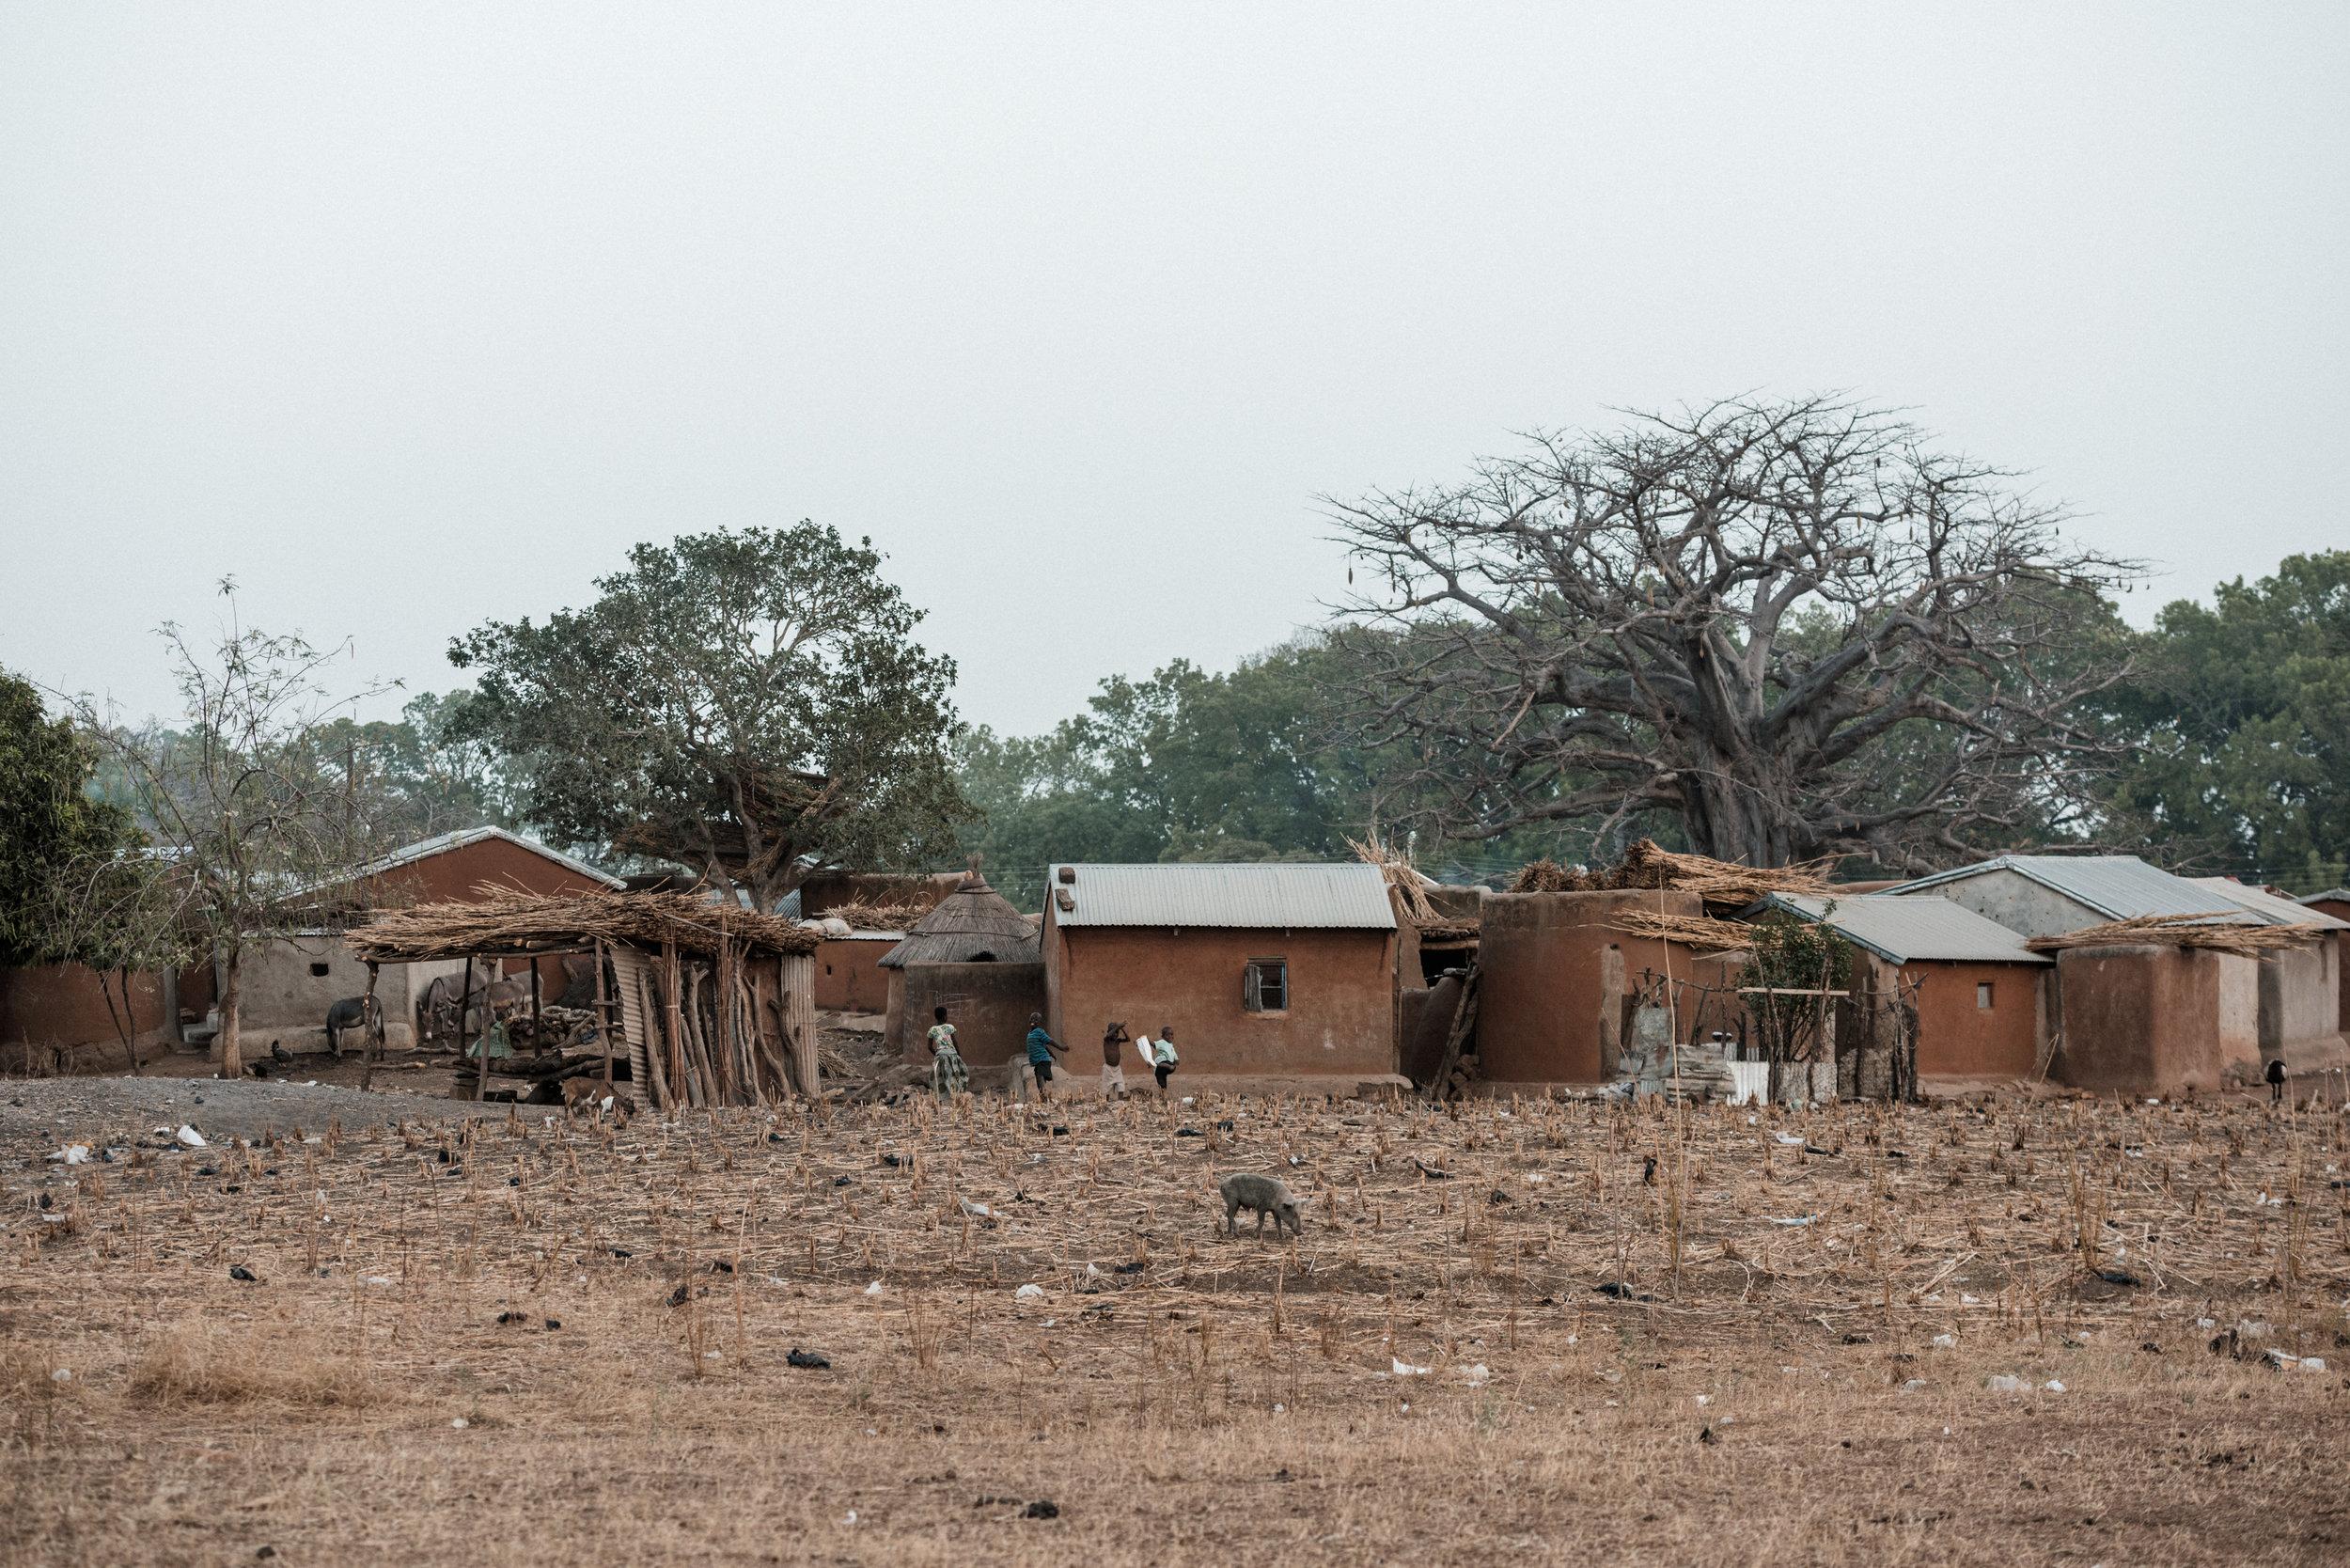 TaraShupe_HumanitarianPhotographer_Woman_Photographer_National_Geographic_Ghana_Women_017.jpg